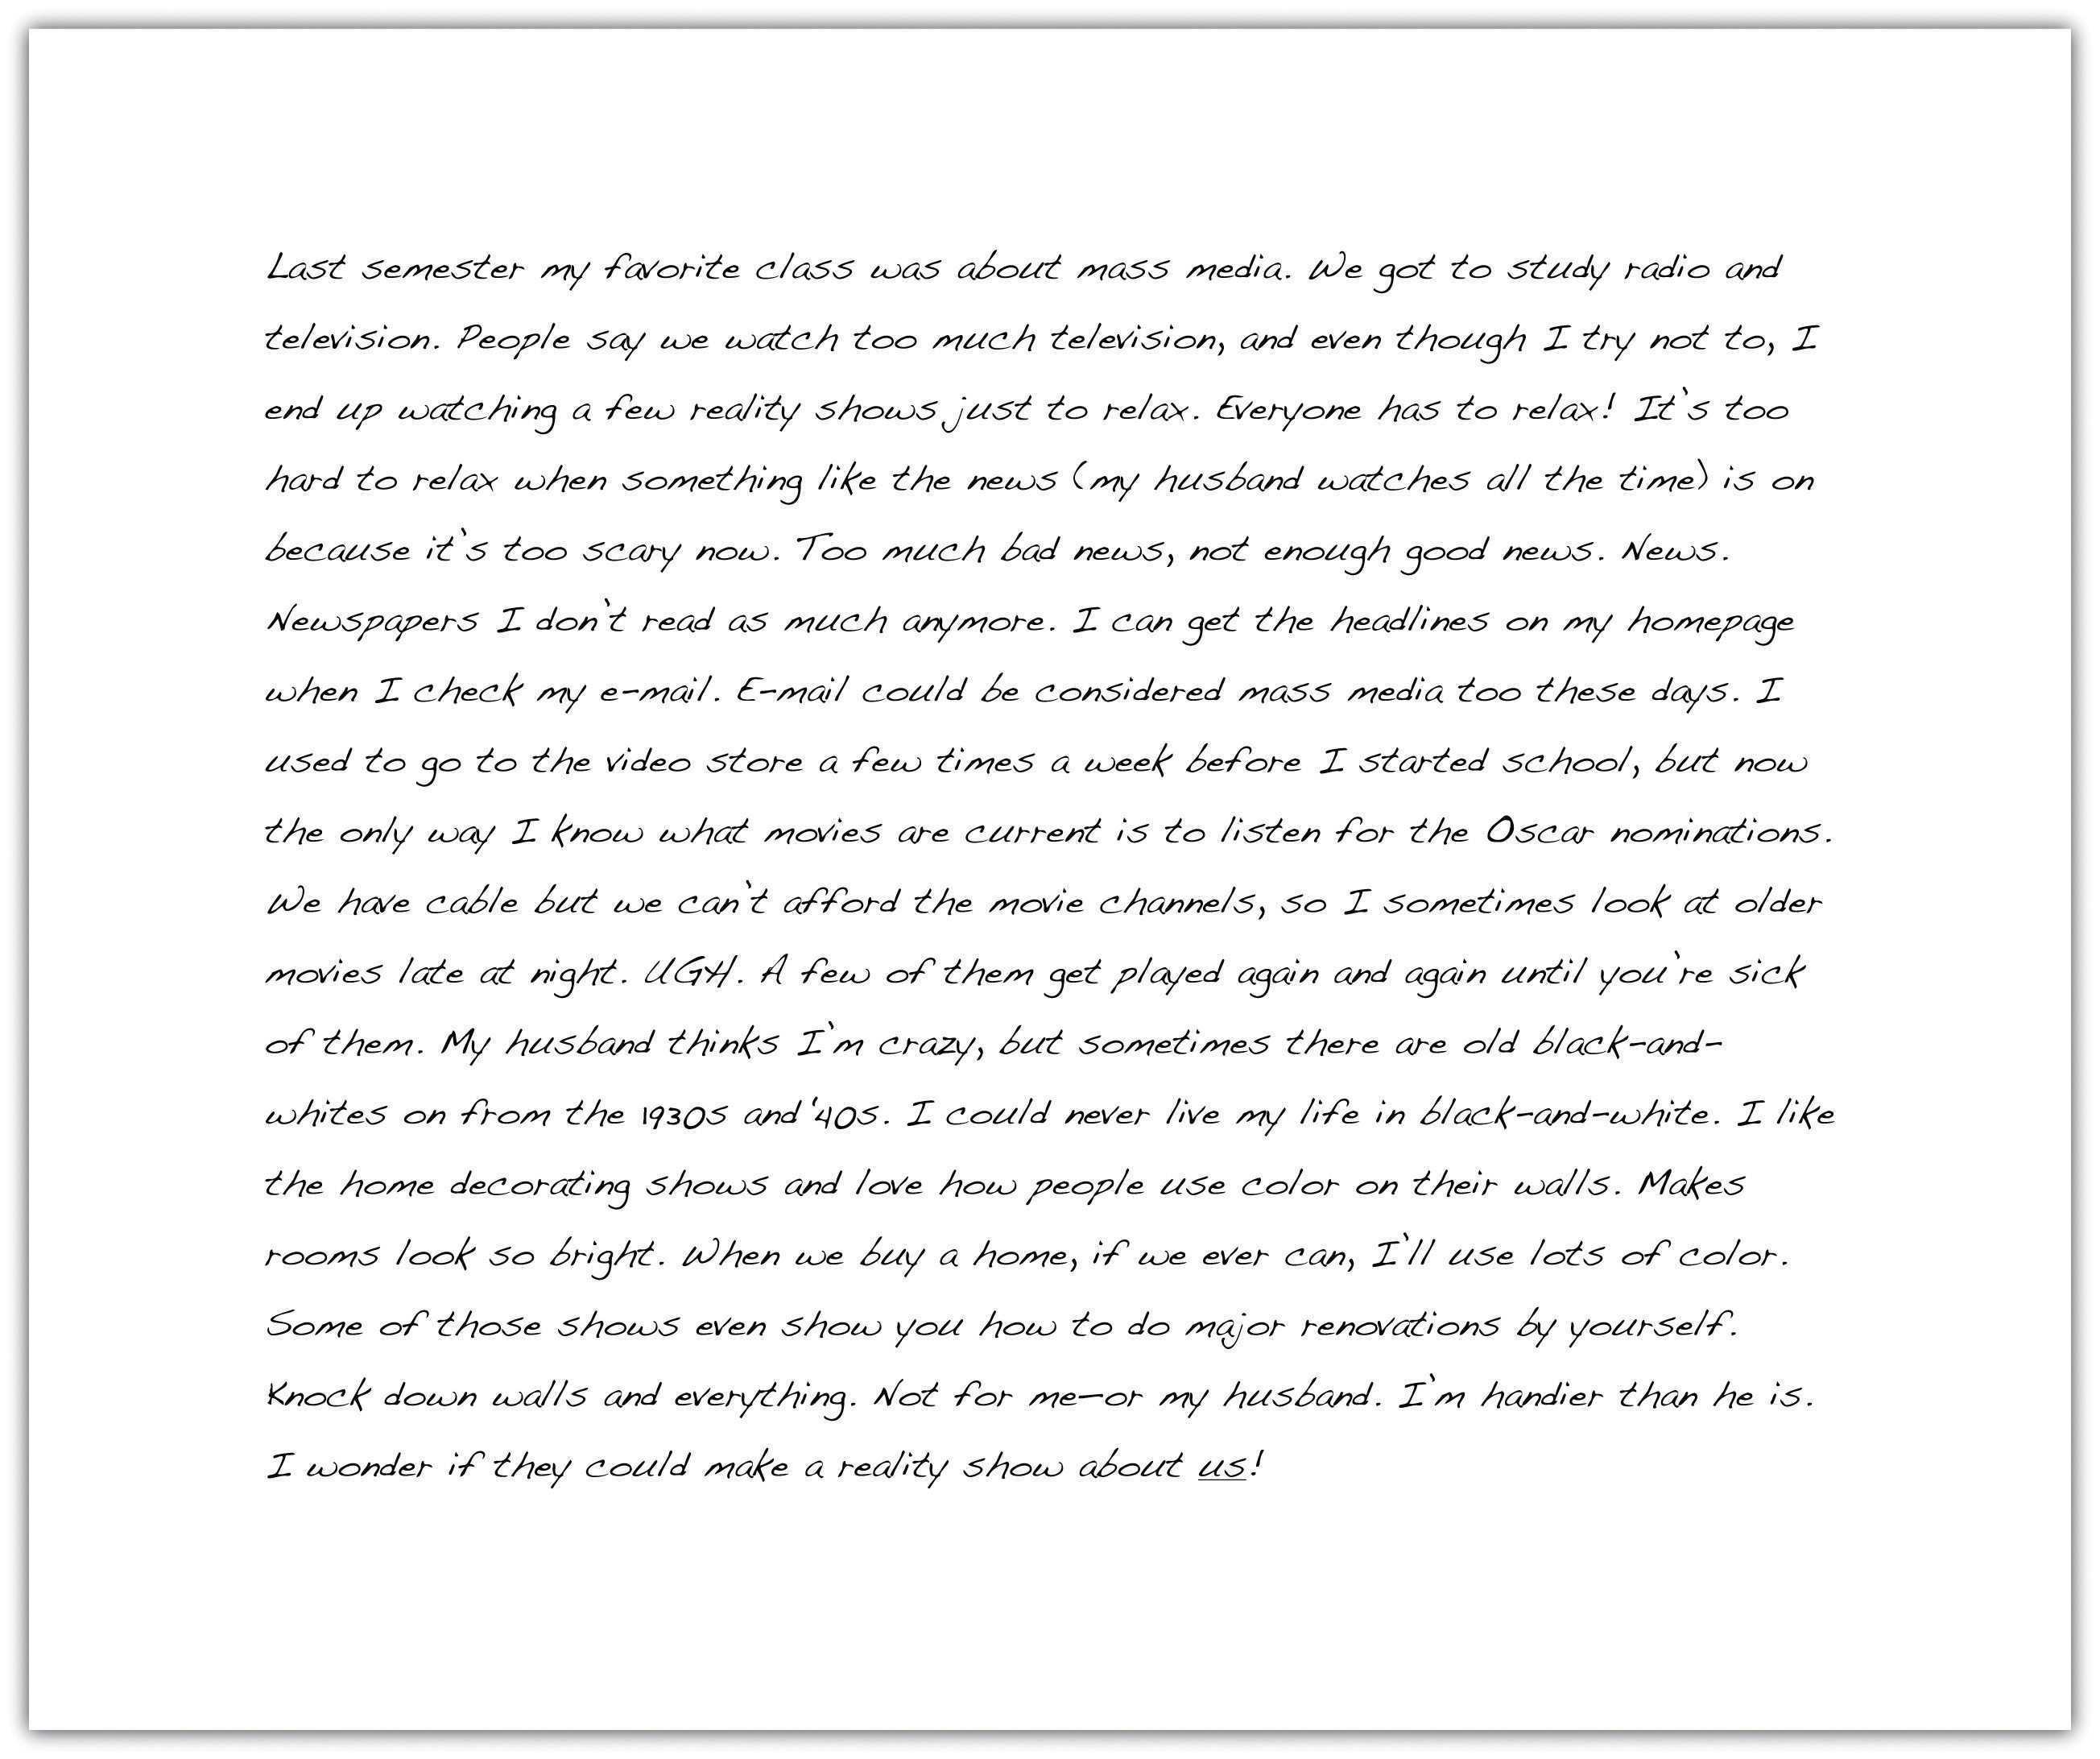 A sample essay